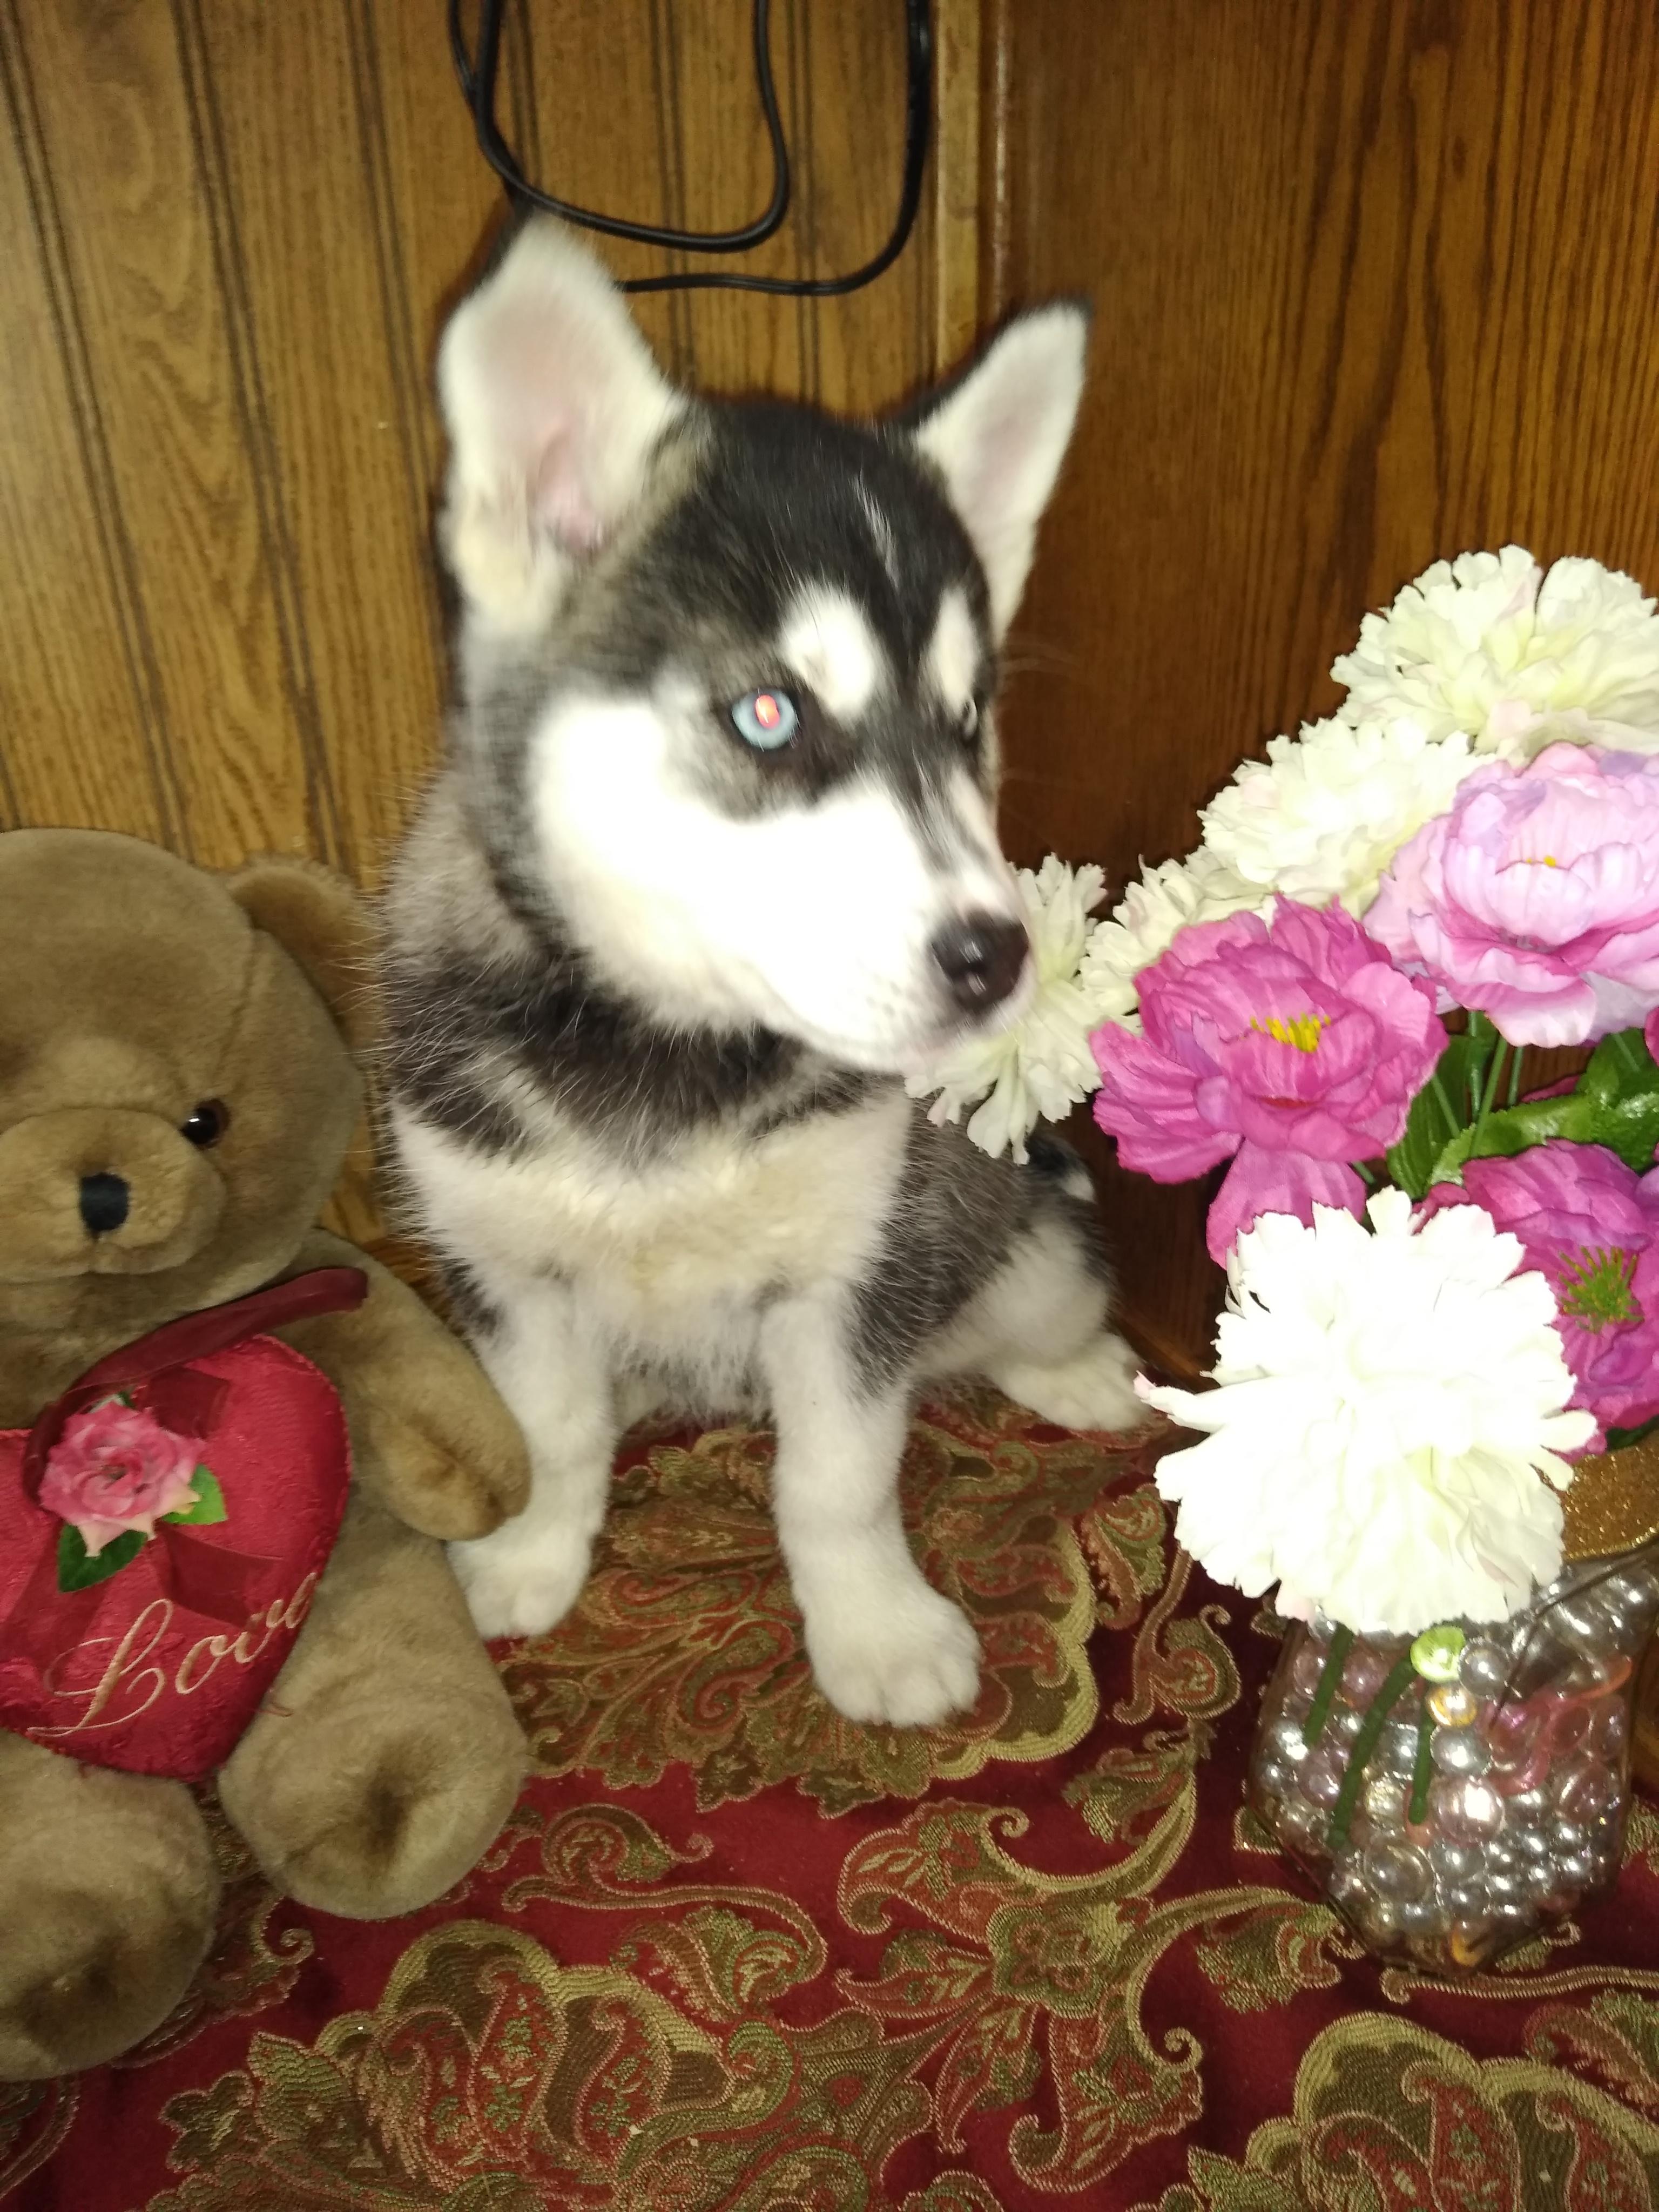 Hailey - a female Siberian Husky puppy for sale near Fort Wayne, Indiana